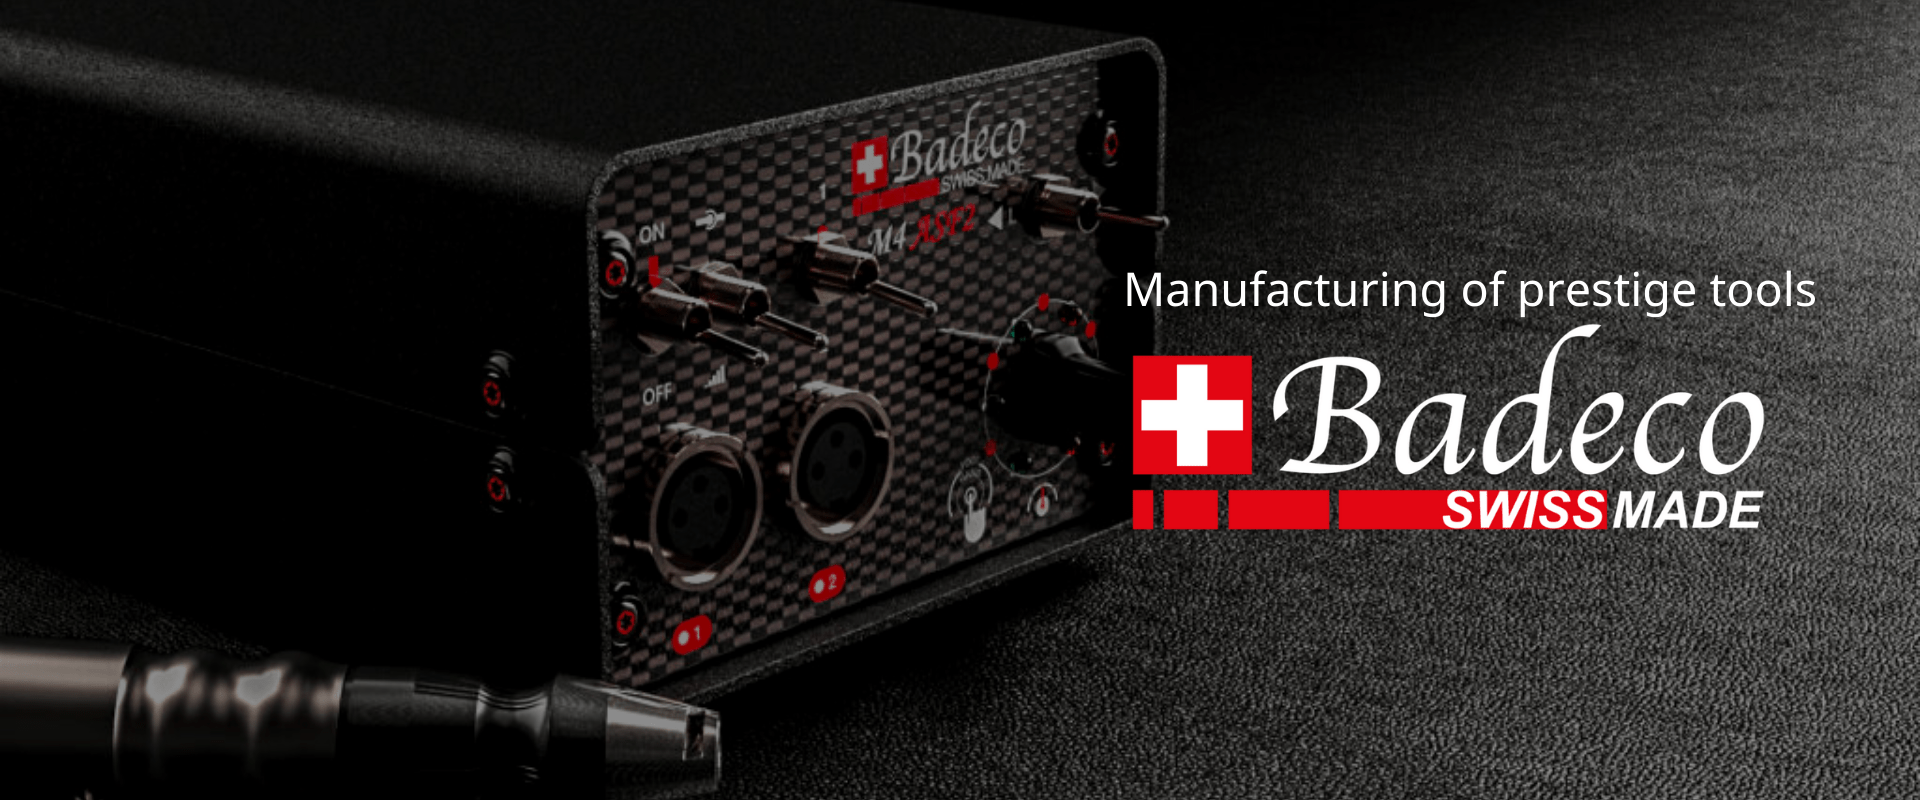 badeco manufacturing of prestige tools